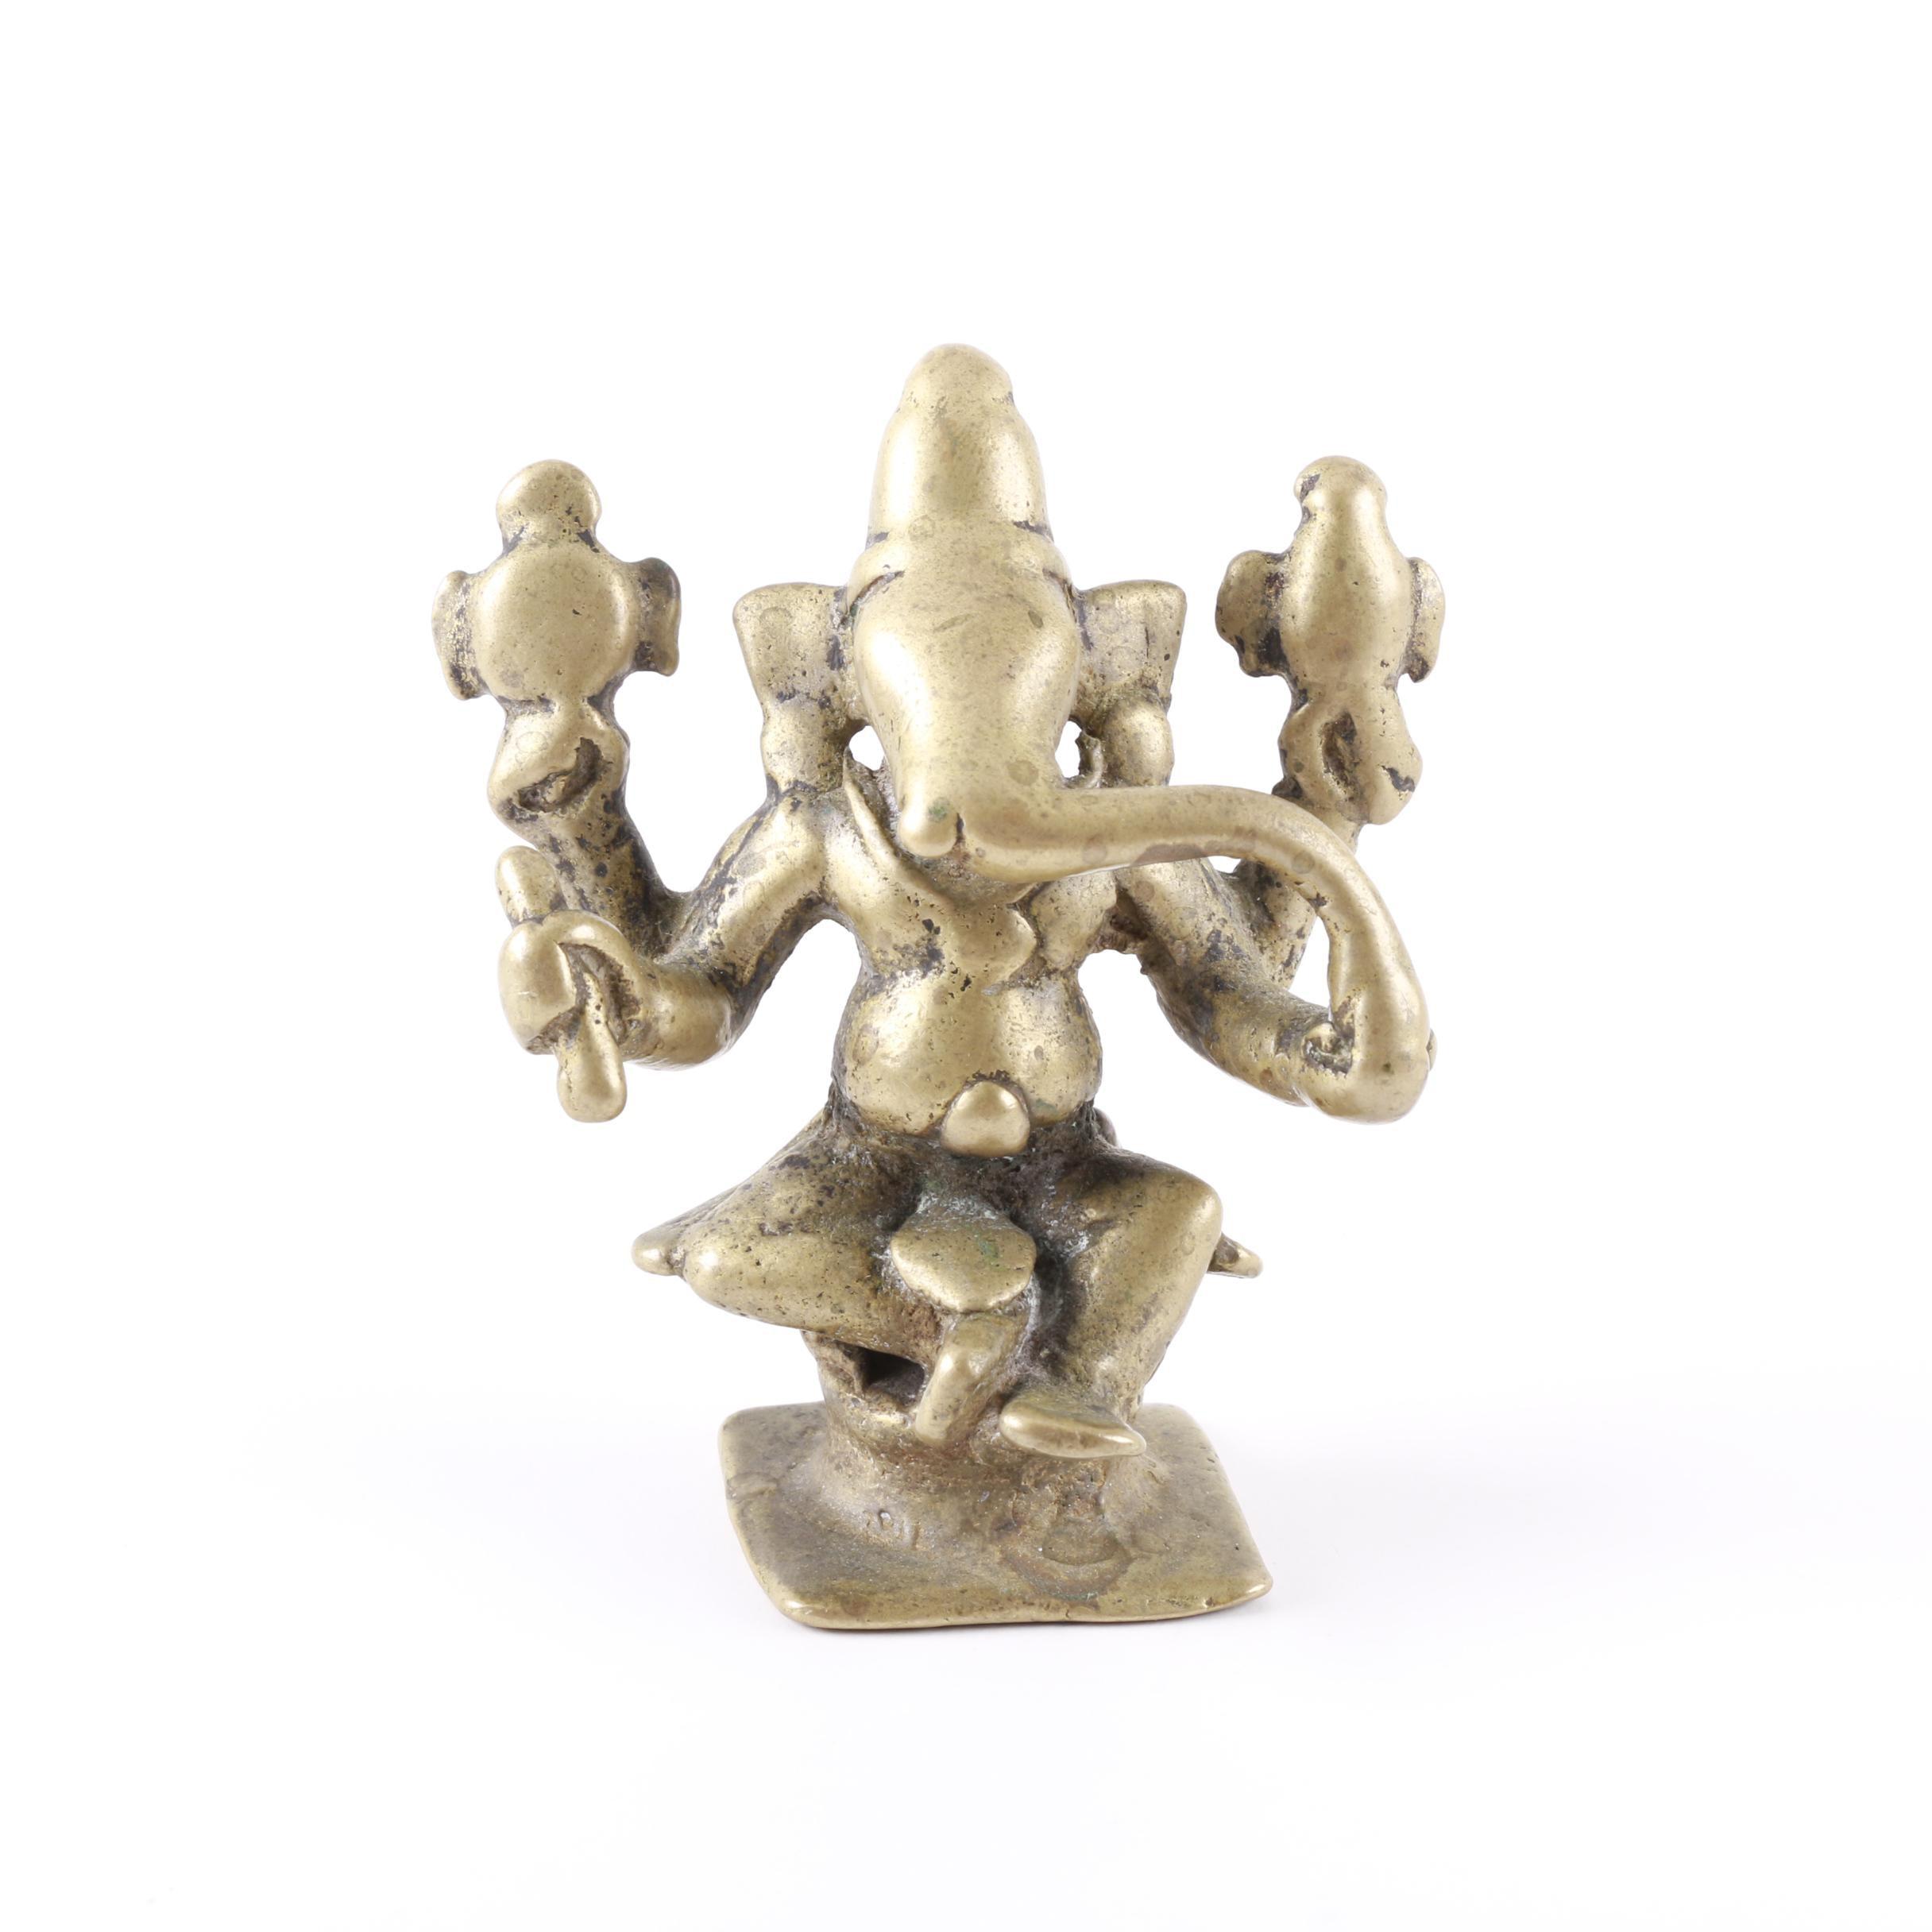 Vintage Brass Lord Ganesha Statuette